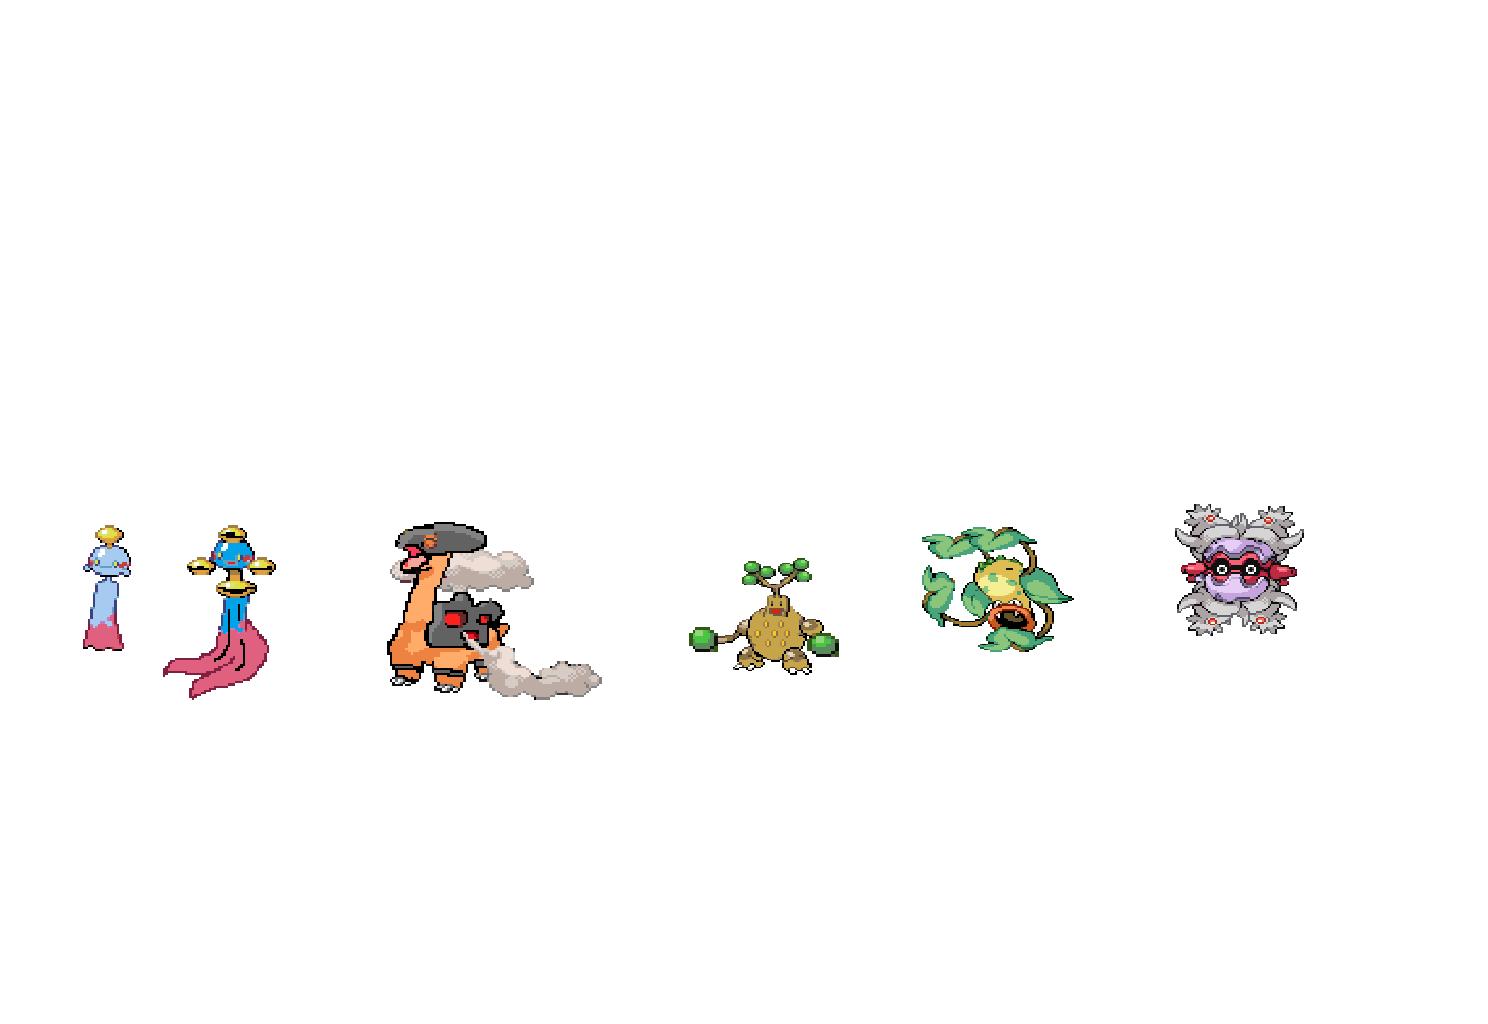 évolution chartor pokémon